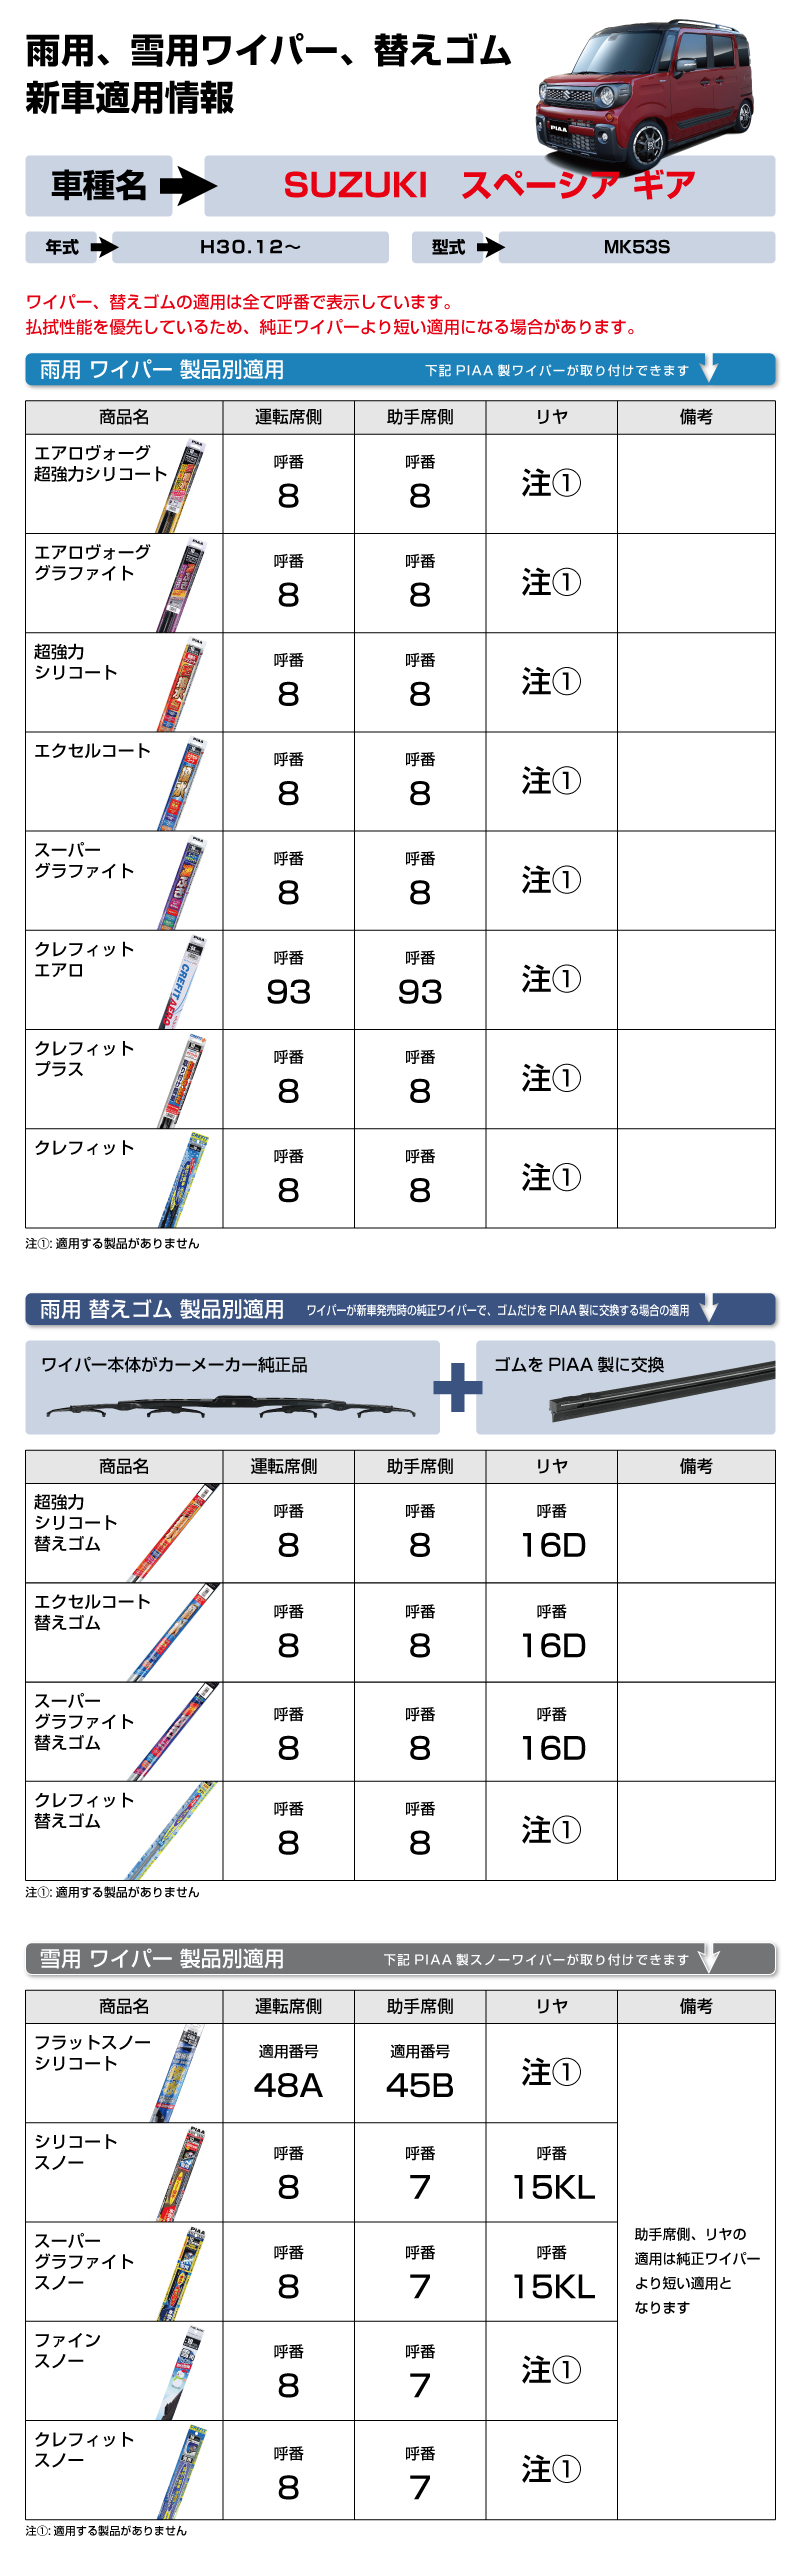 TEKIYOU_SUZUKI_SPACIAGEAR_1_H30.12